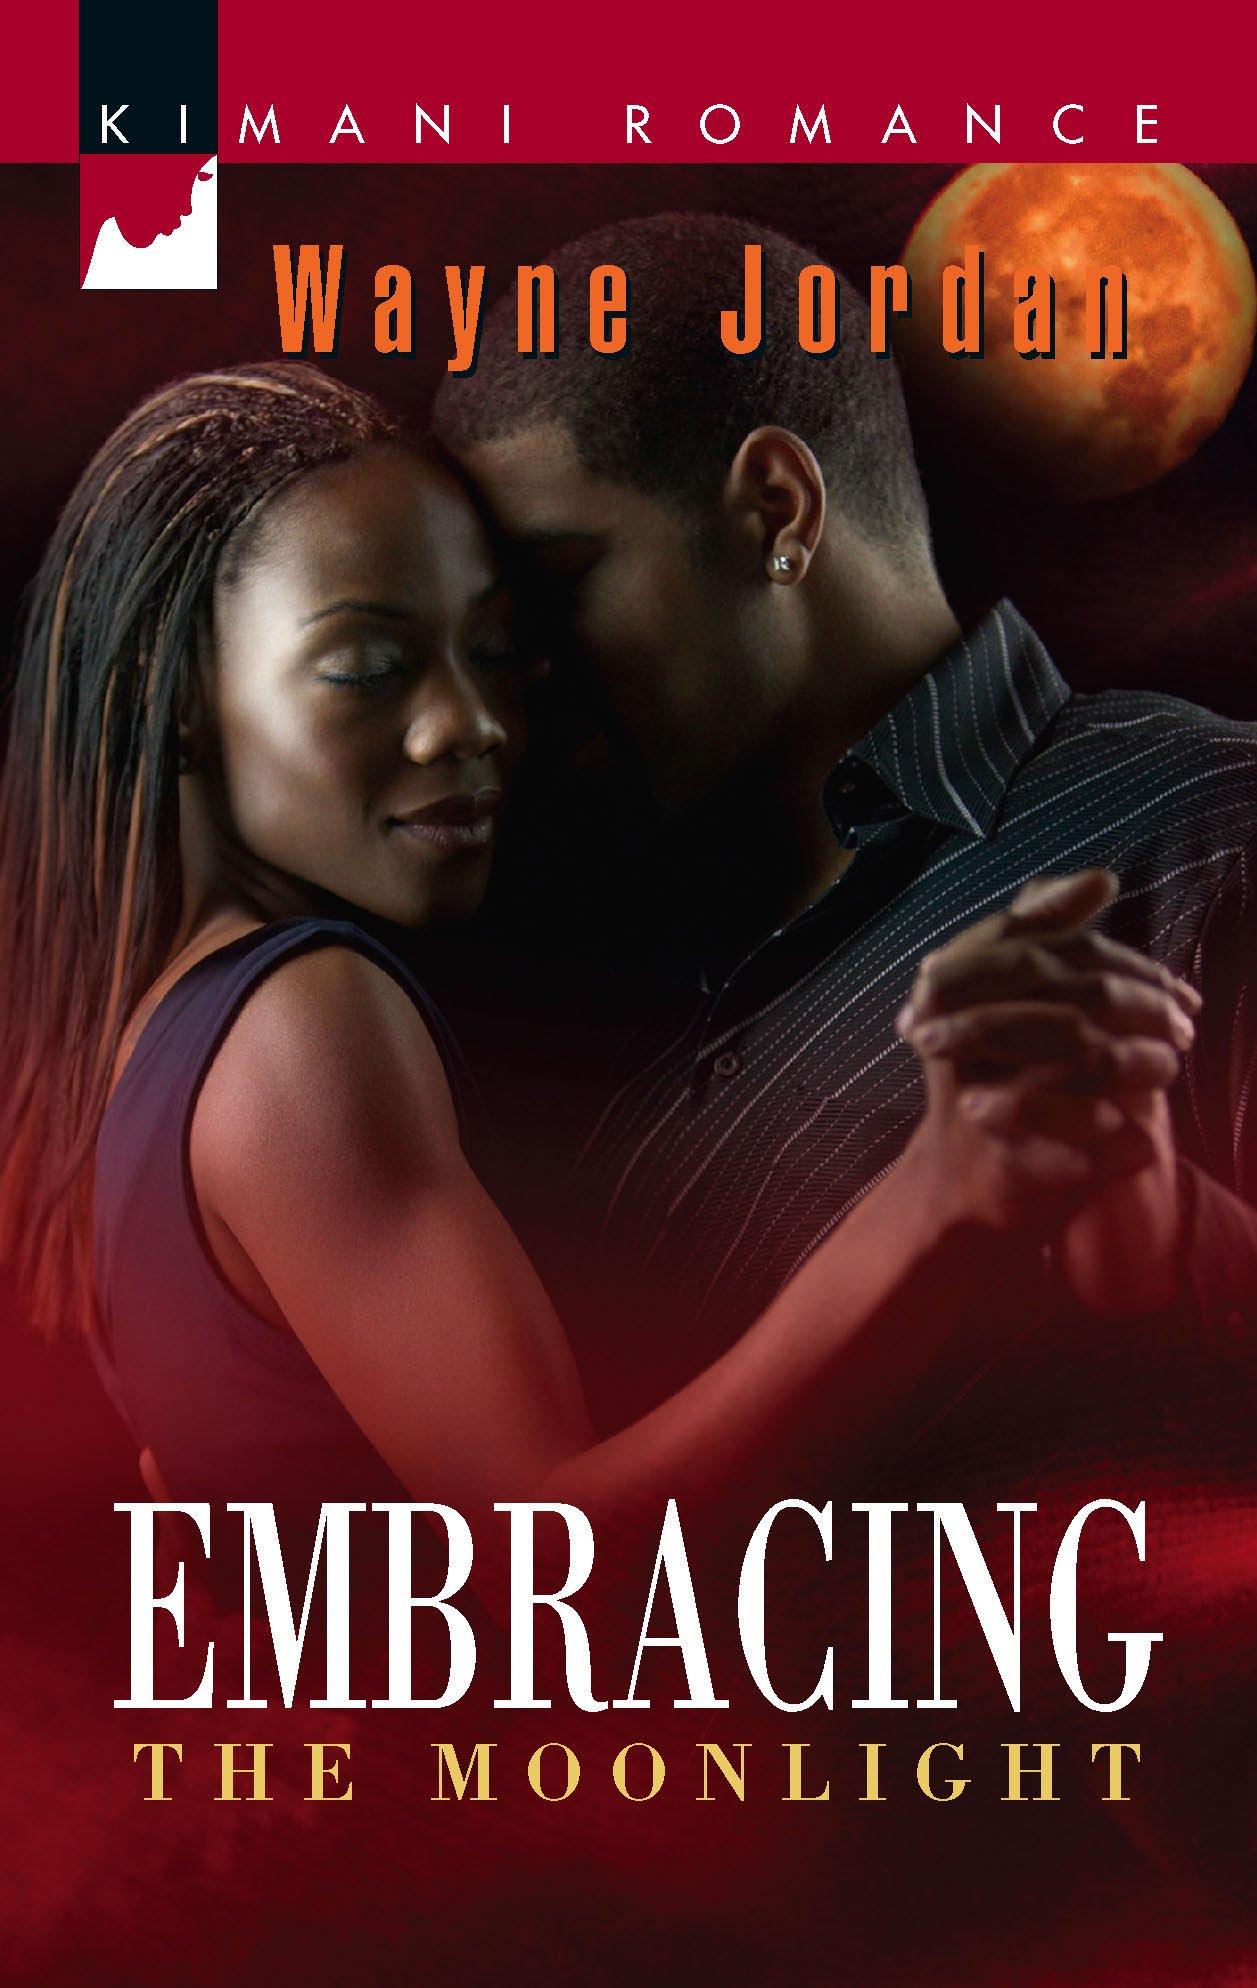 Amazon.com: Embracing The Moonlight (Kimani Romance) (9781583147818): Wayne  Jordan: Books